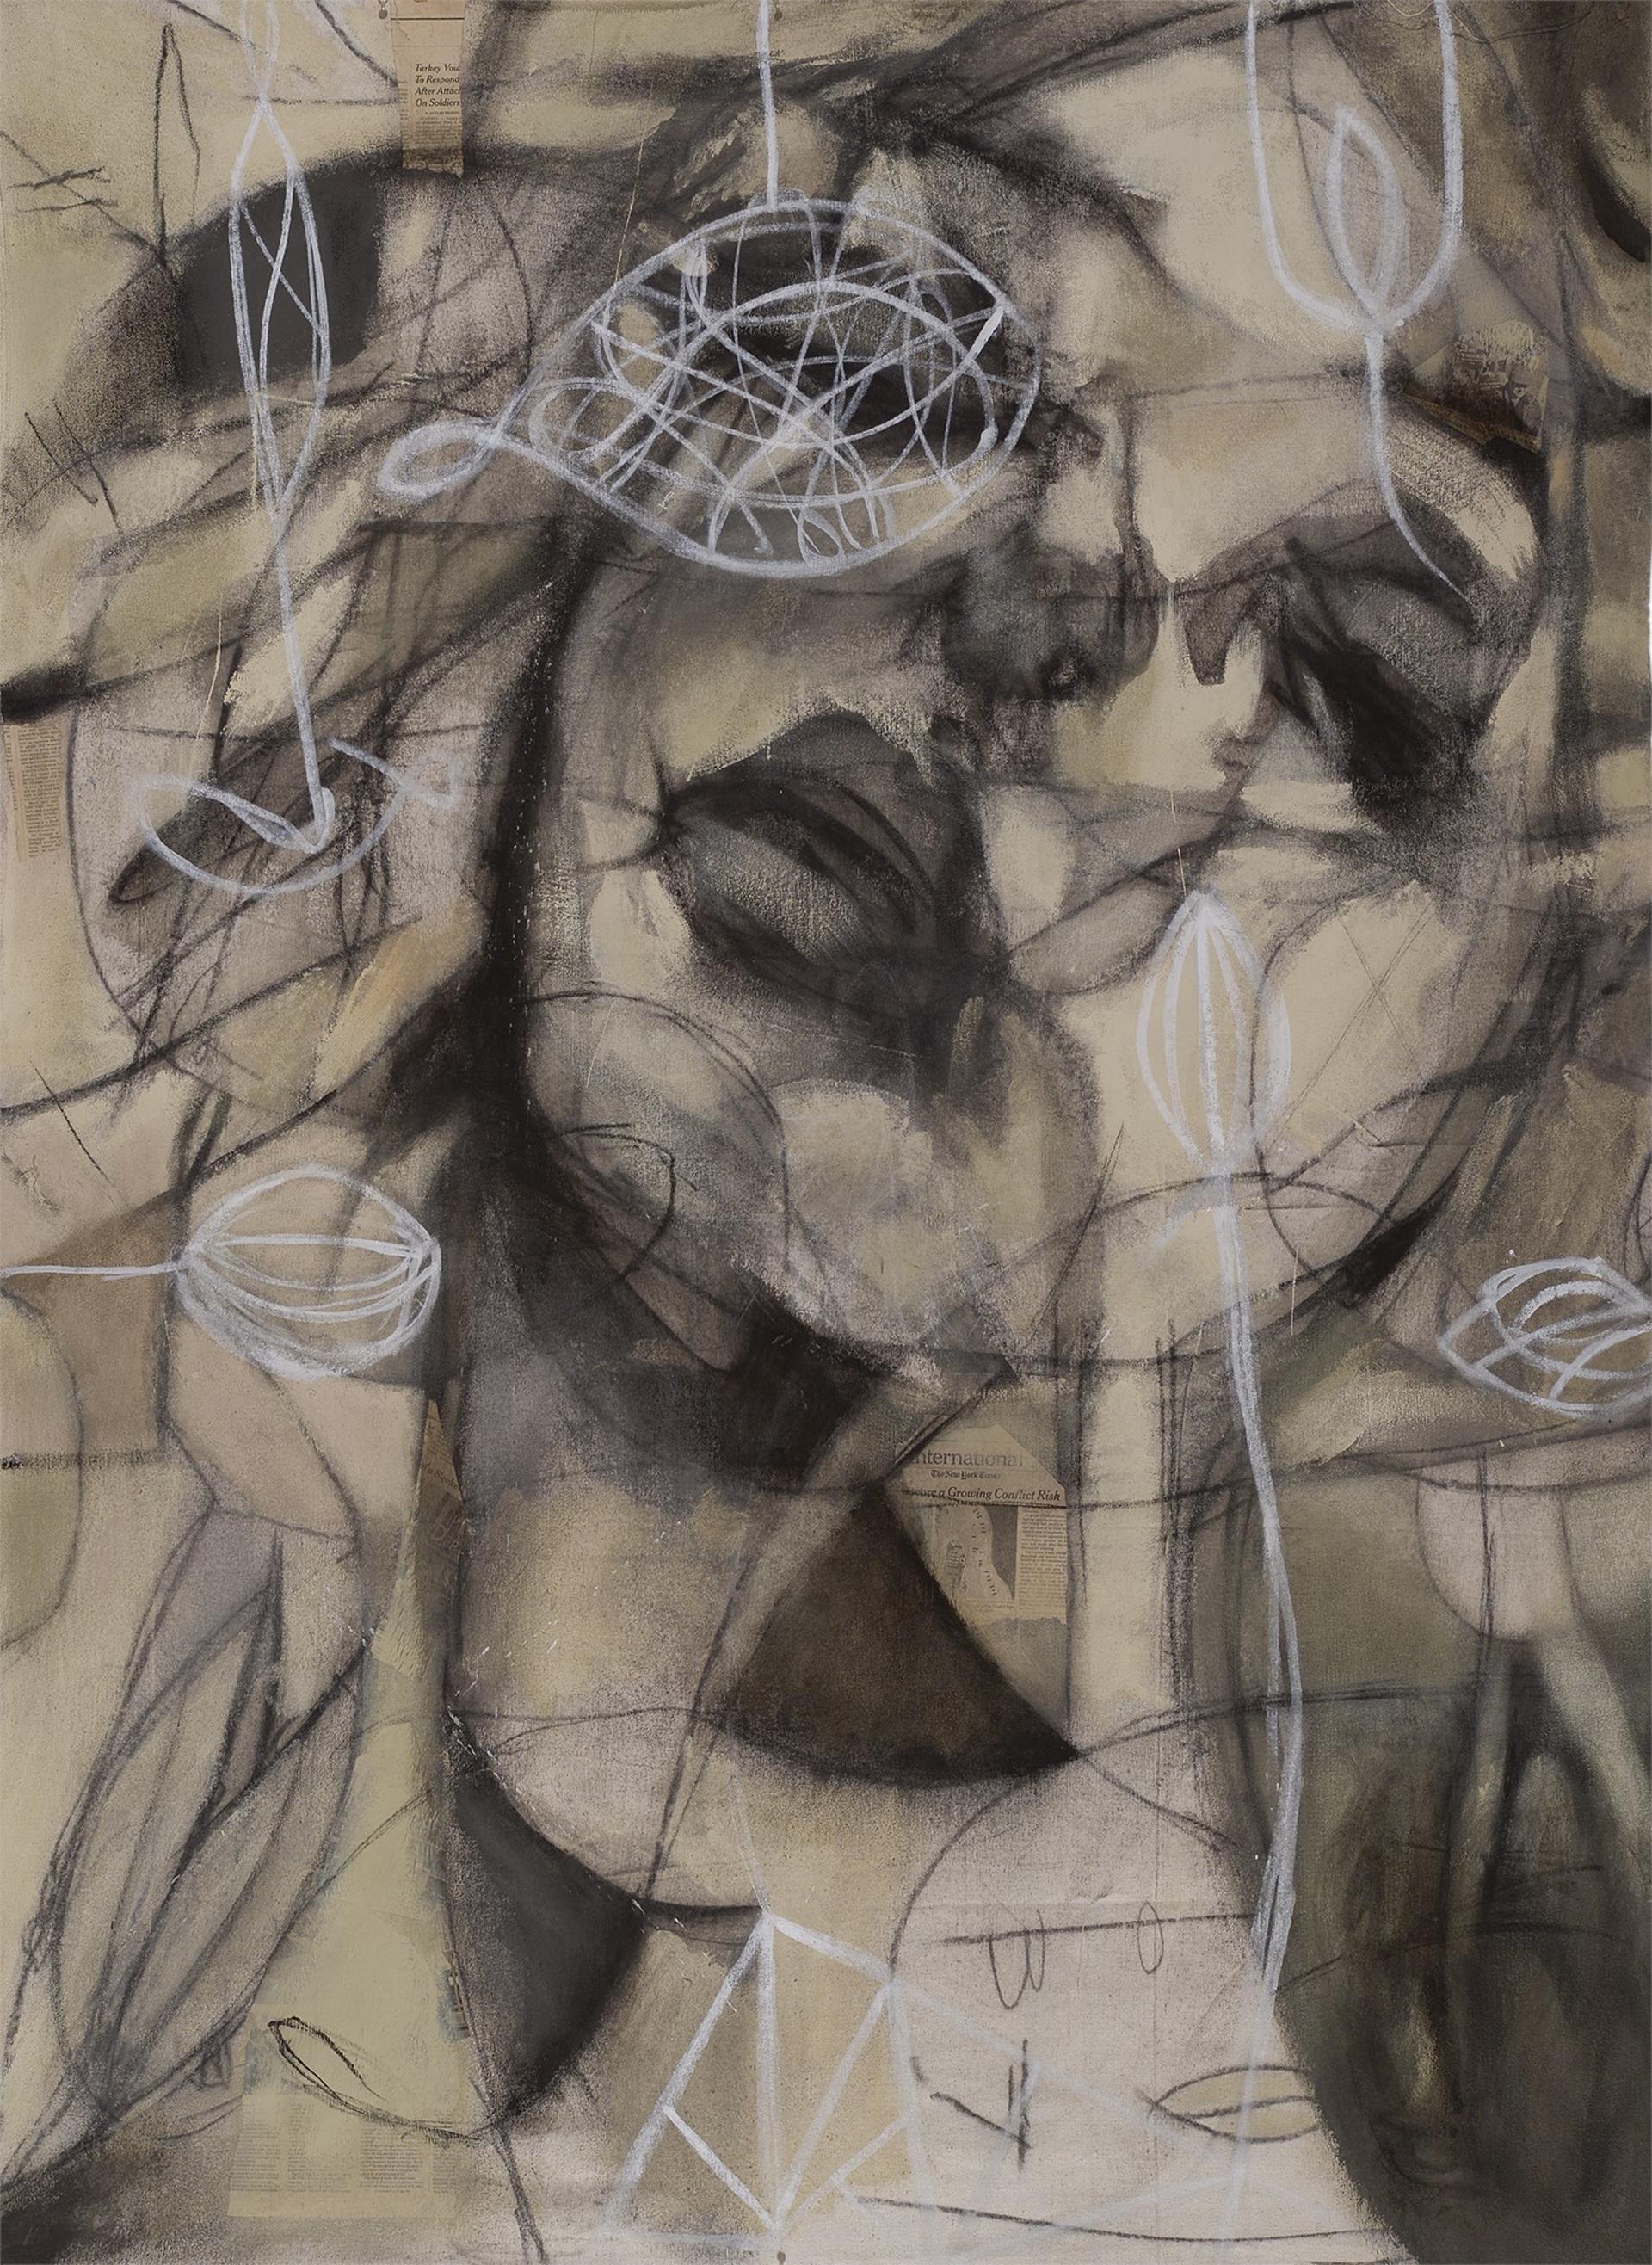 Lotus Eater (No. 69) by Michael Gadlin